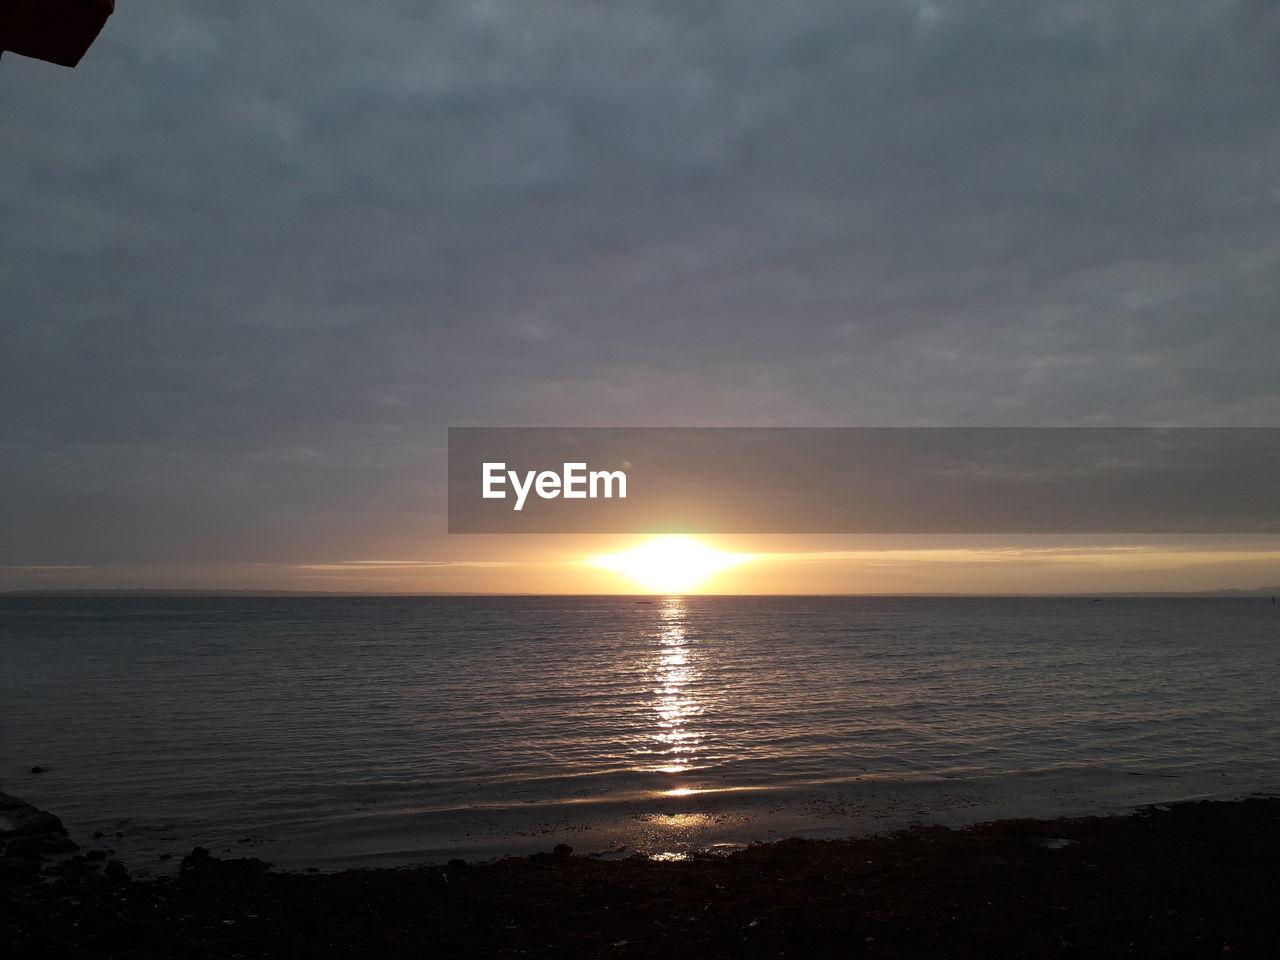 sky, water, sea, sunset, beauty in nature, tranquility, scenics - nature, sun, horizon, tranquil scene, horizon over water, nature, cloud - sky, no people, beach, land, reflection, sunlight, idyllic, outdoors